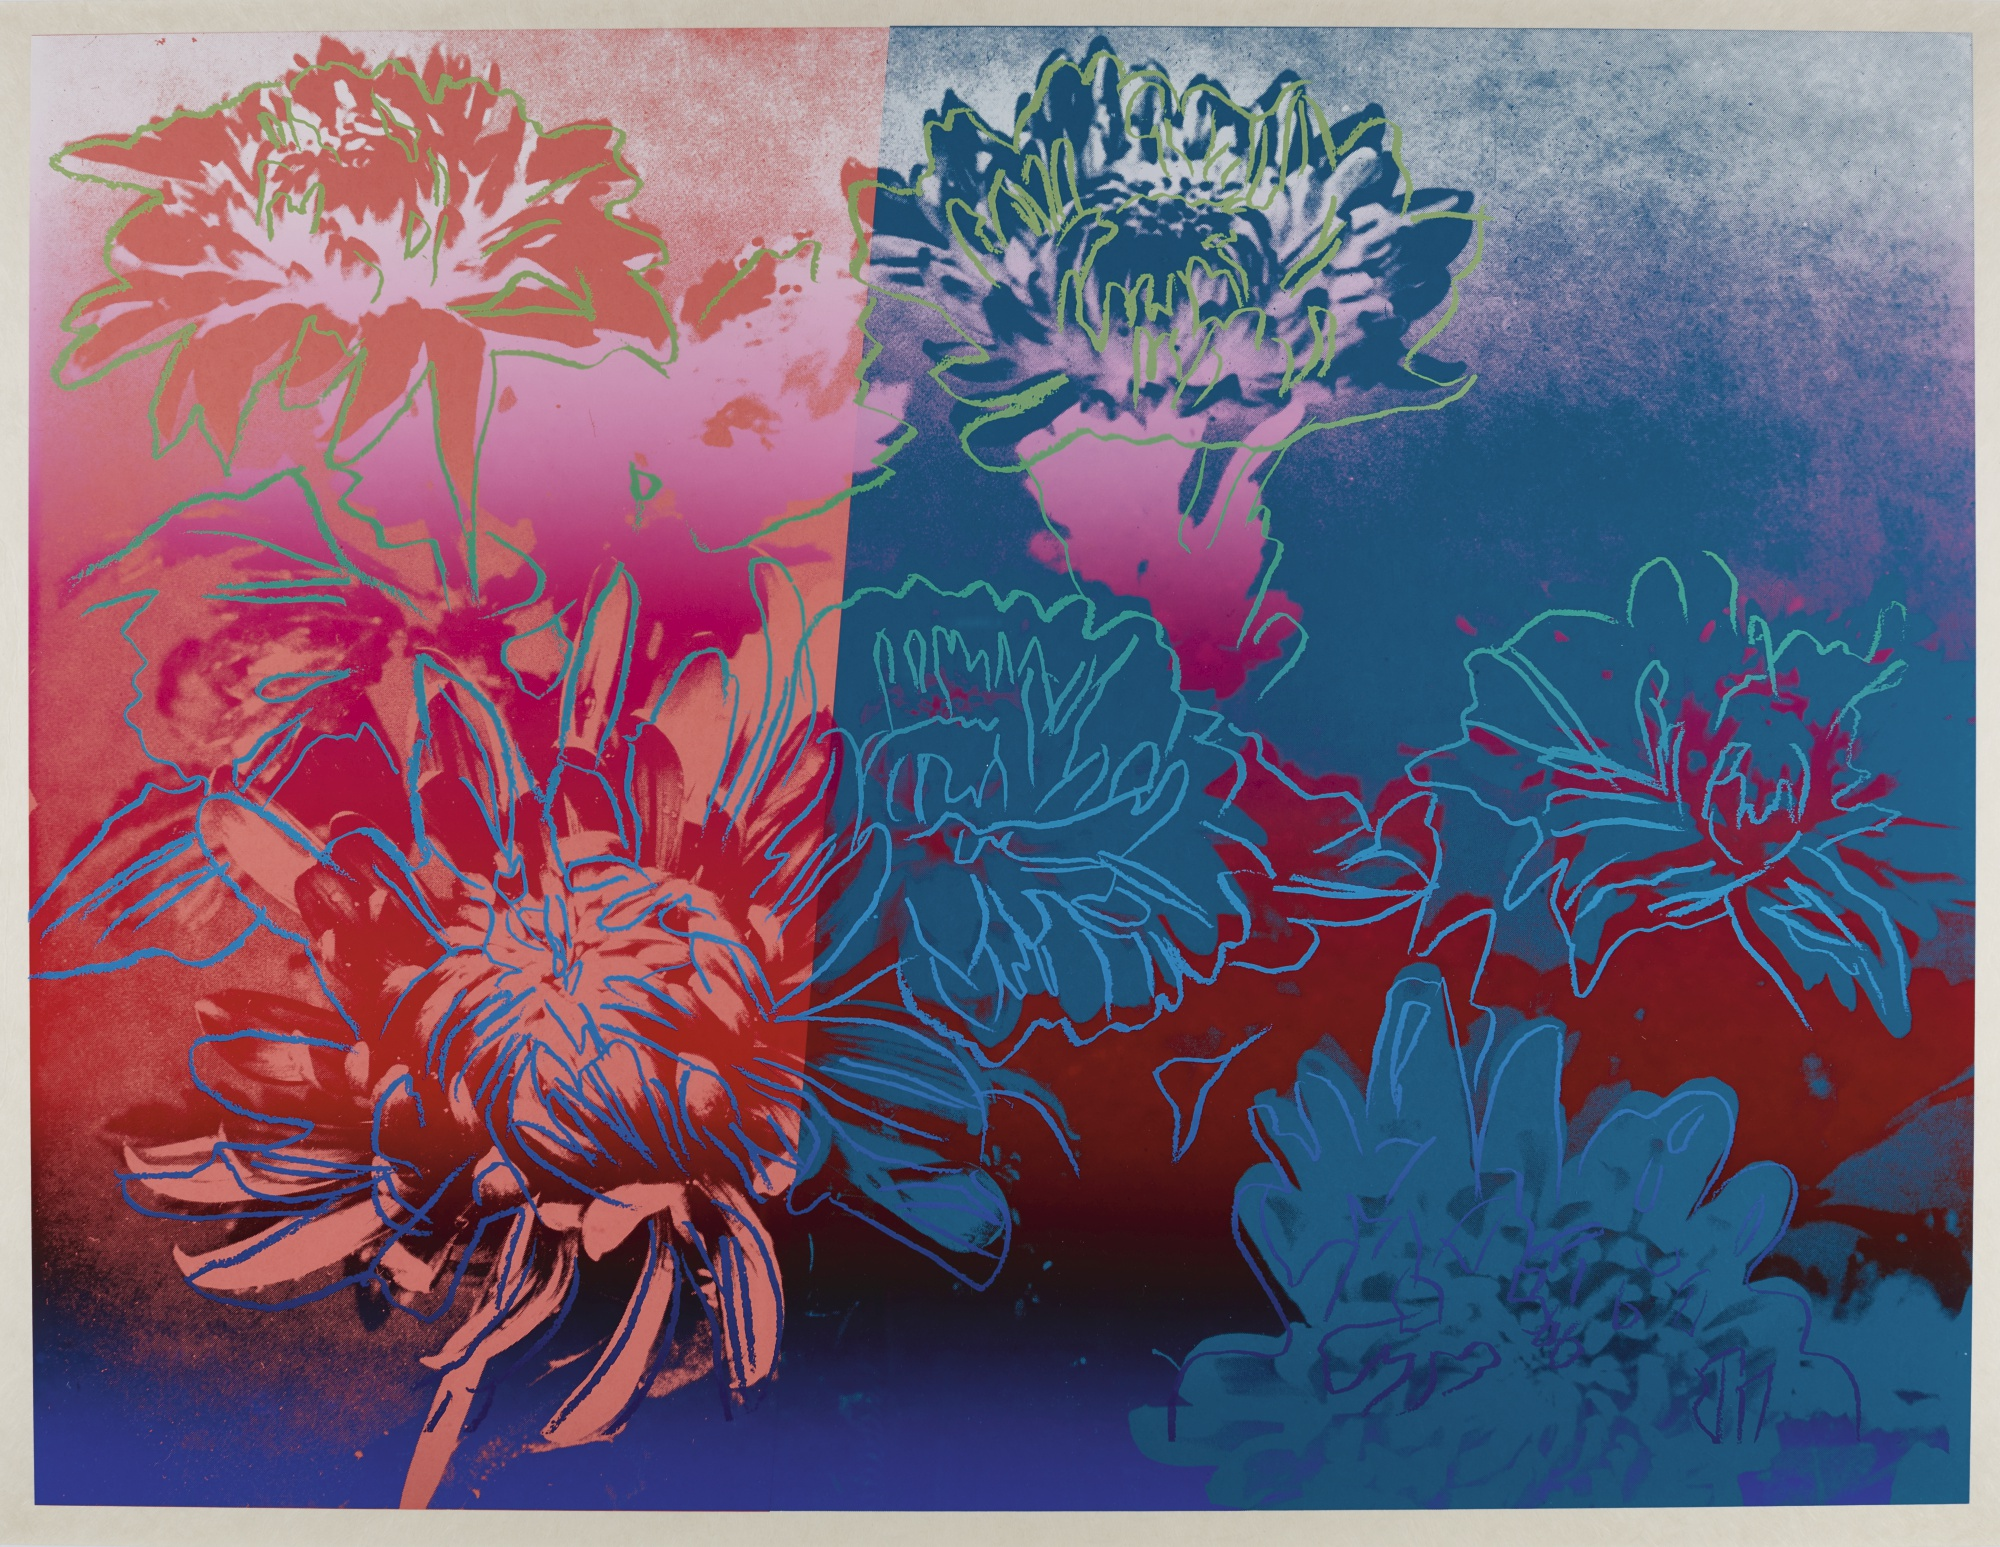 Andy Warhol-Kiku (See F. & S. II.309)-1983